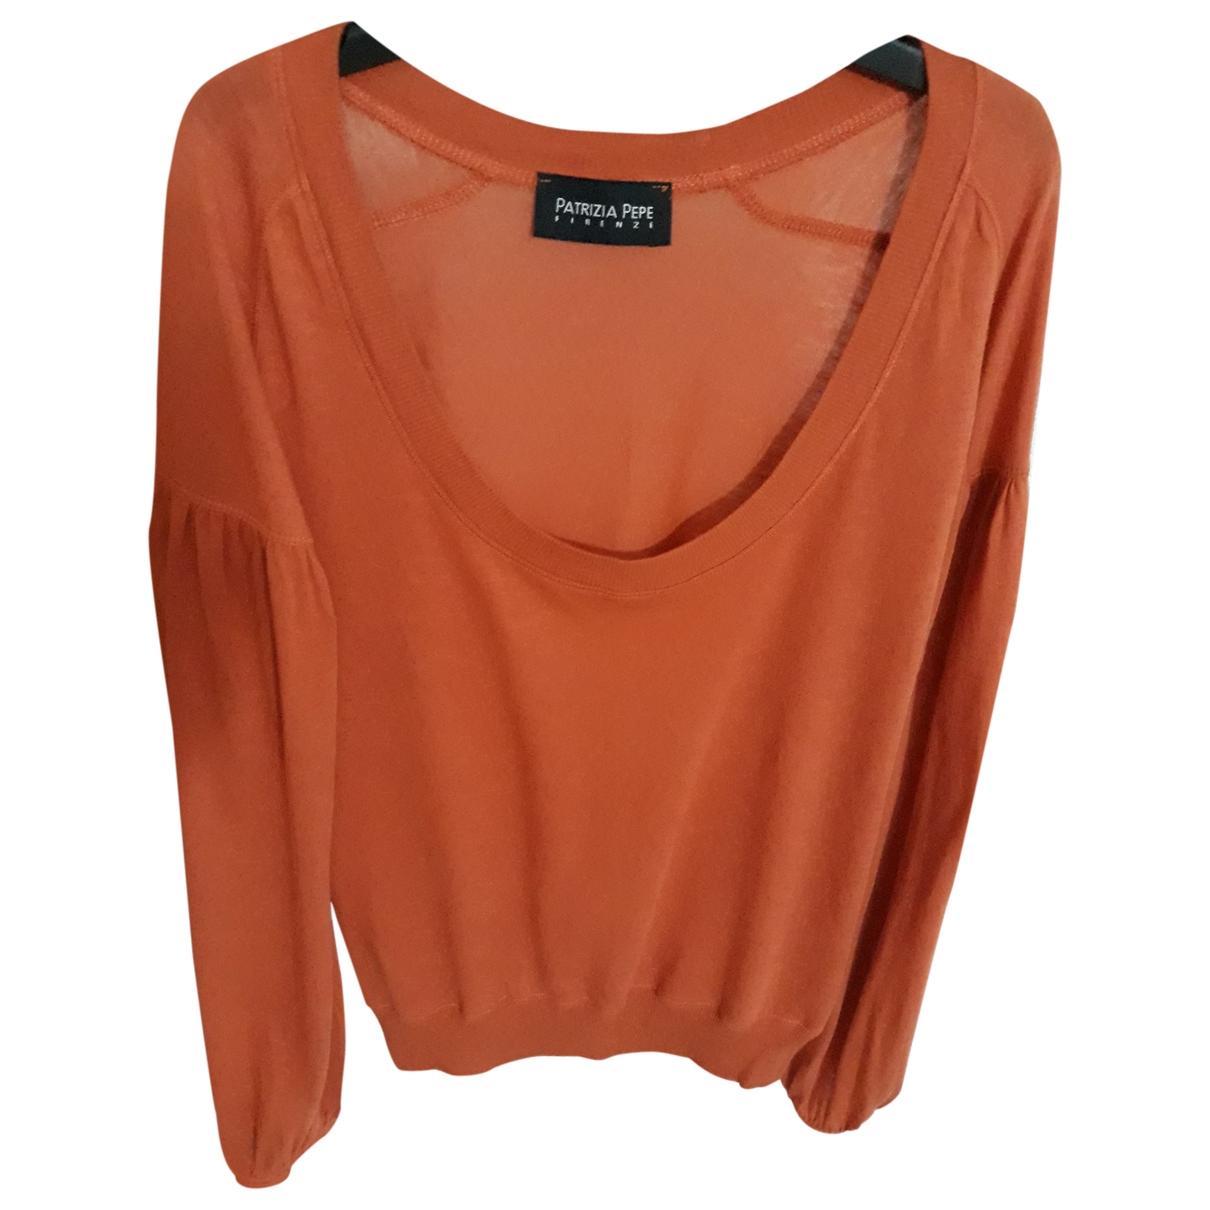 Patrizia Pepe \N Orange Cotton  top for Women M International